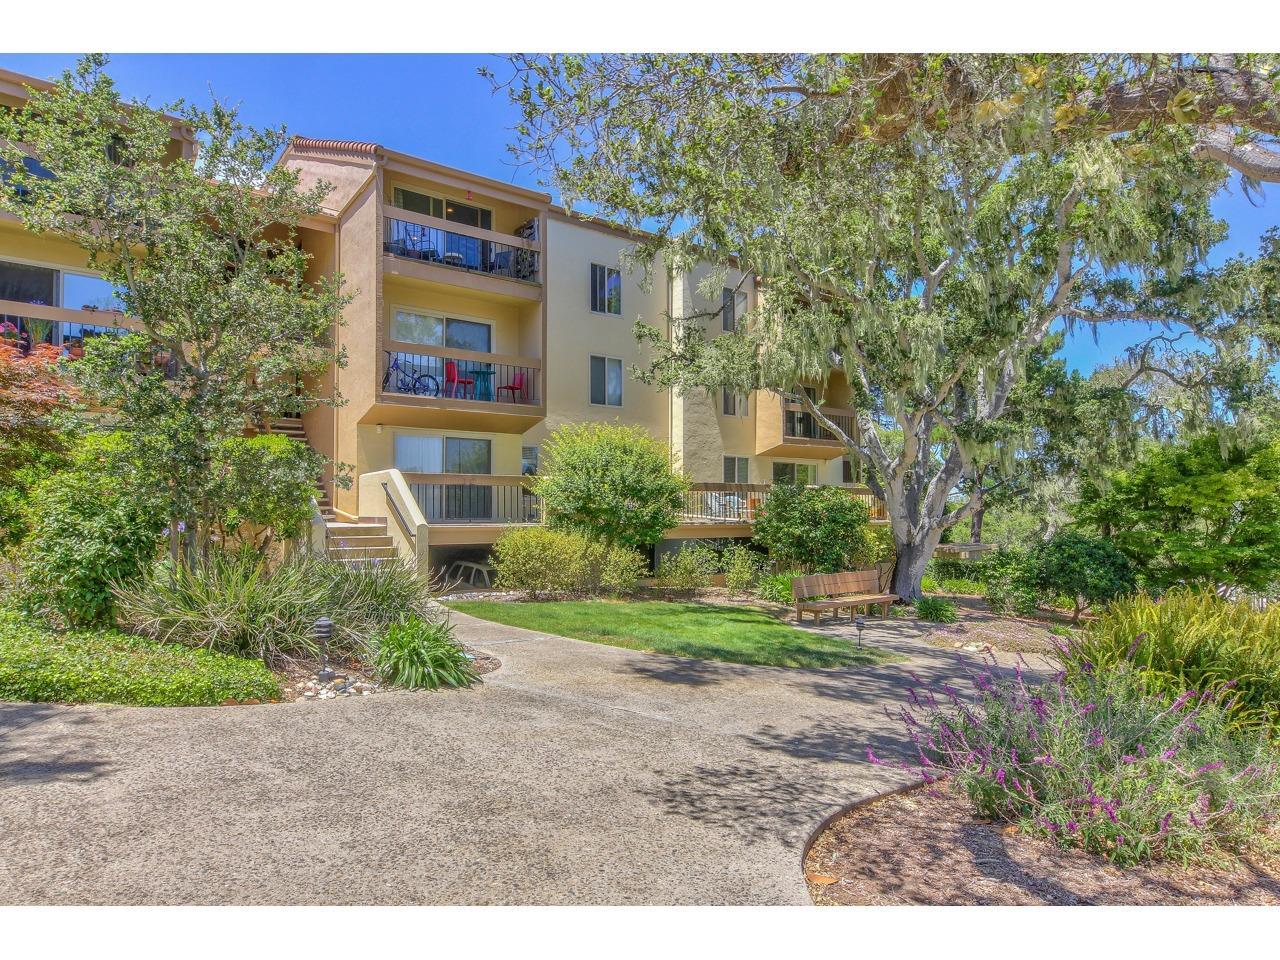 Photo of 2303 Golden Oaks LN, MONTEREY, CA 93940